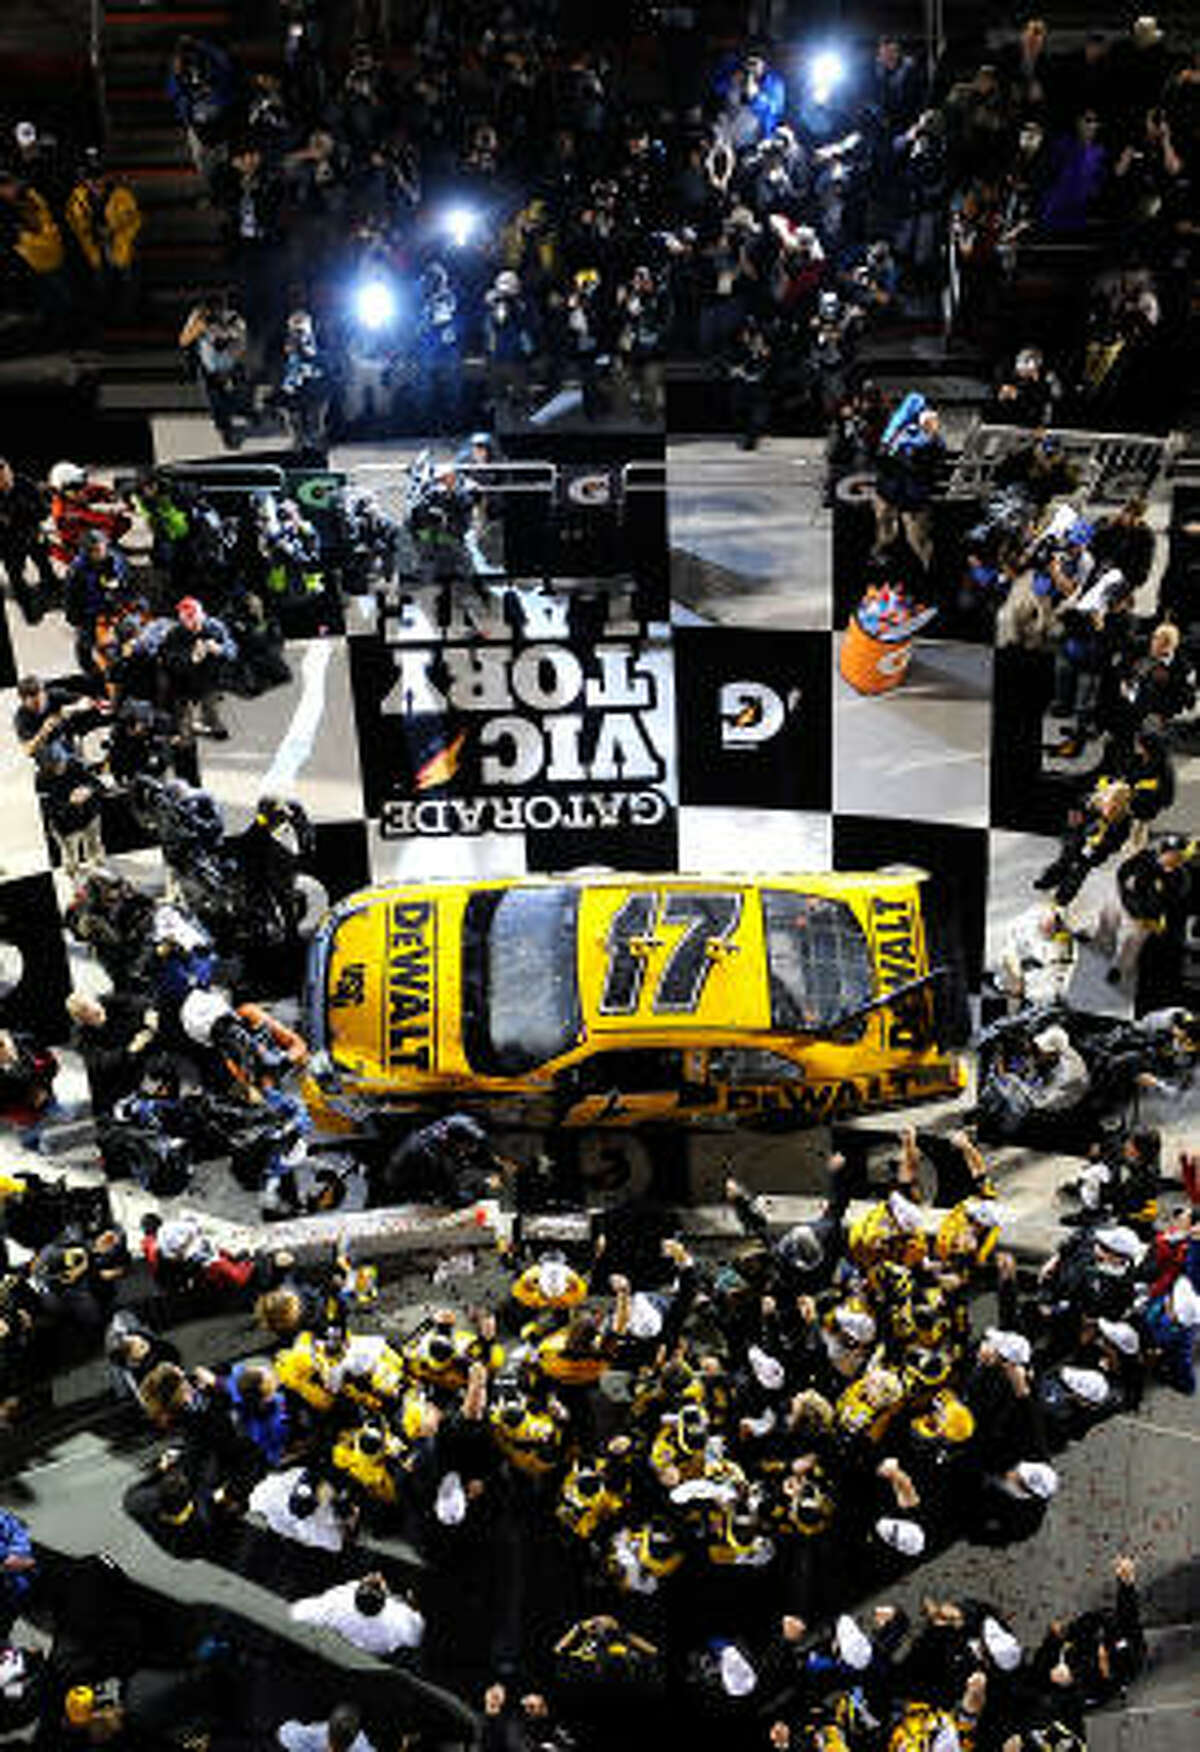 Matt Kenseth parks in Victory Lane after winning the Daytona 500.